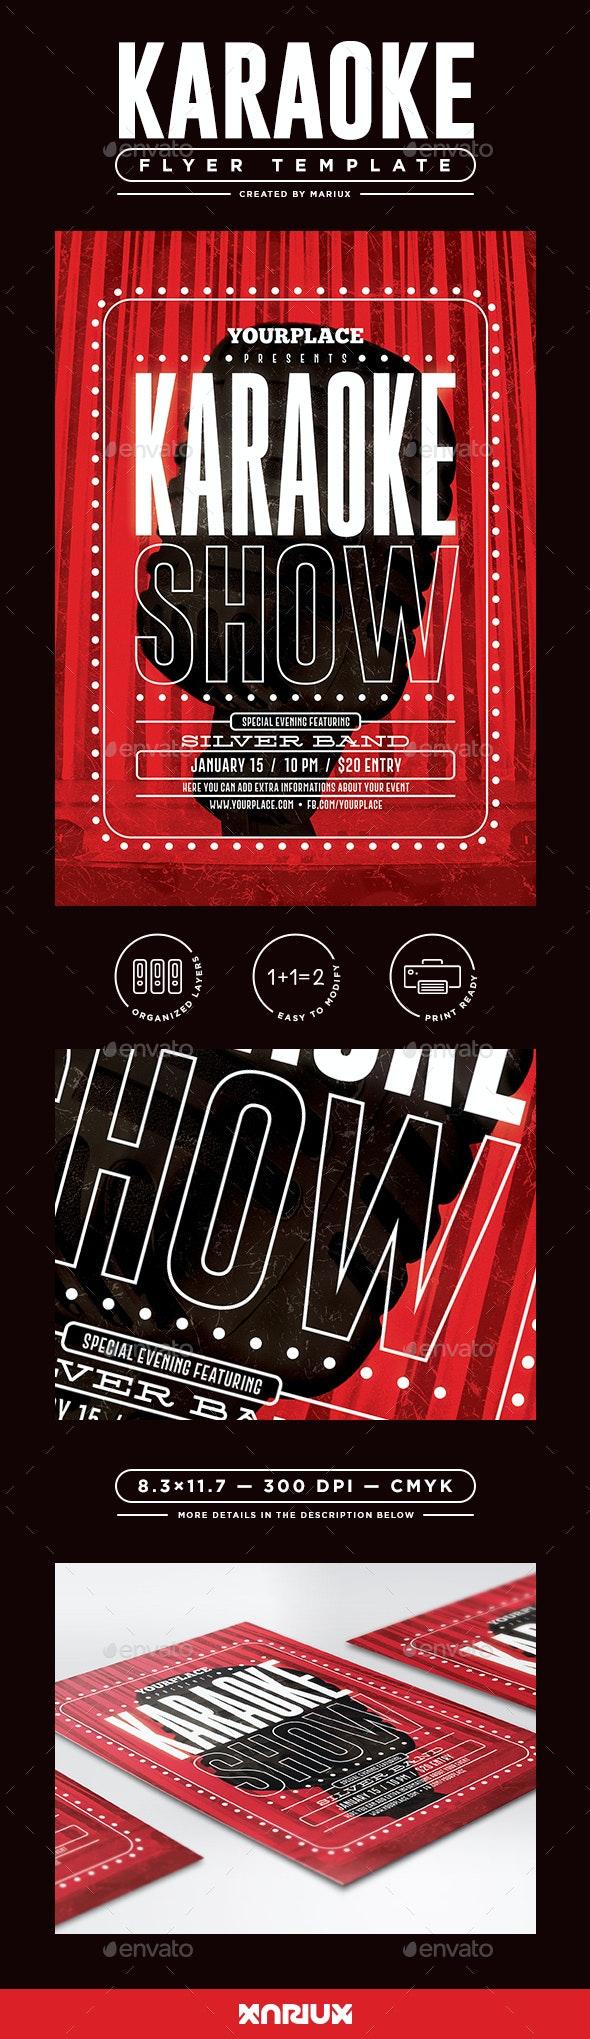 Karaoke Party Flyer/Poster - Events Flyers